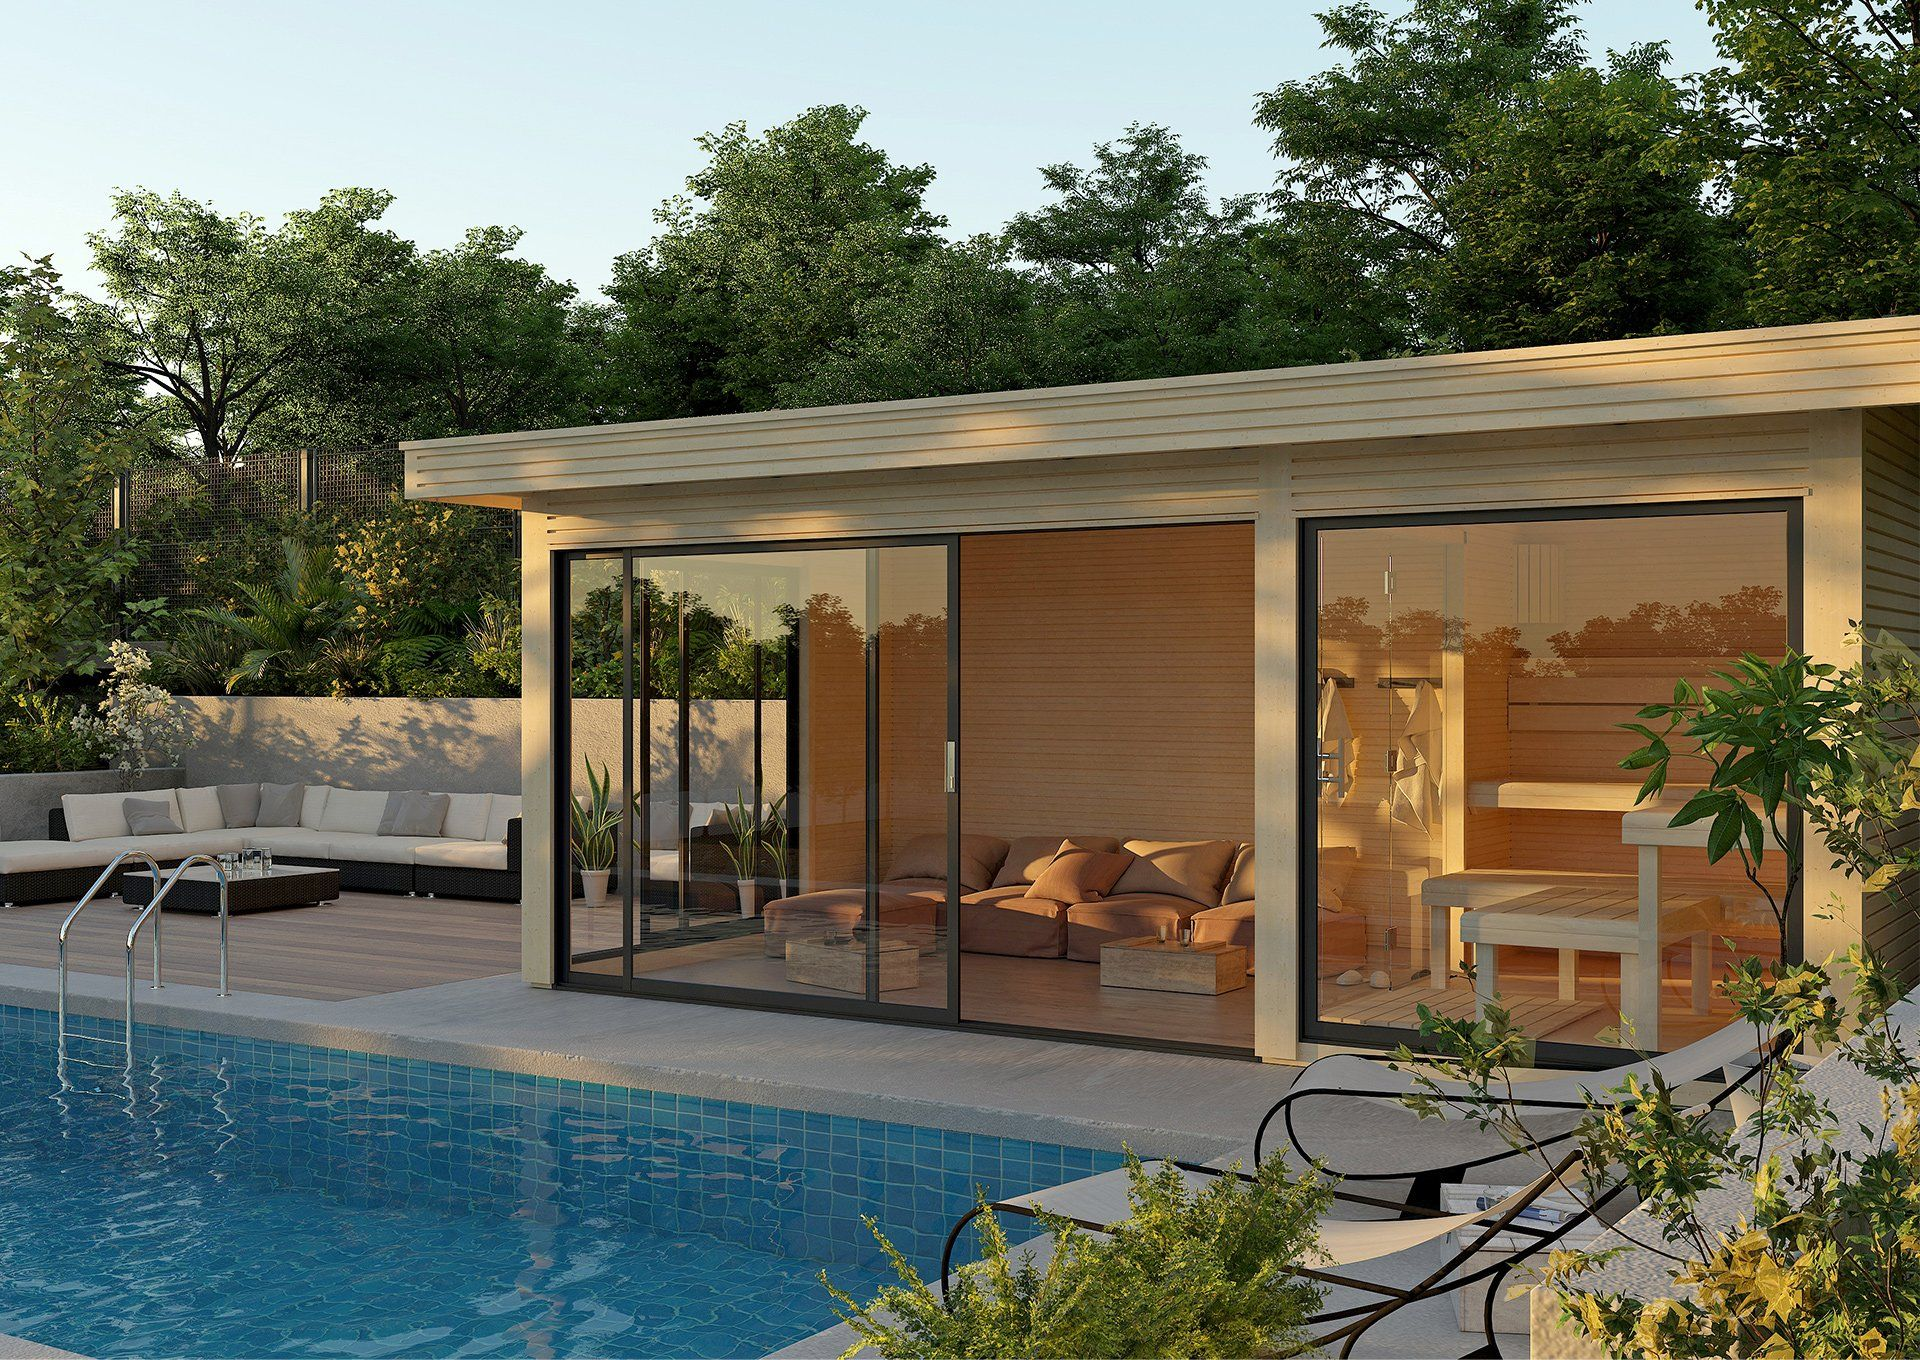 Butenas Gartenhaus Shine Plus Butenas Gartenhaus Haus Aussenverkleidung